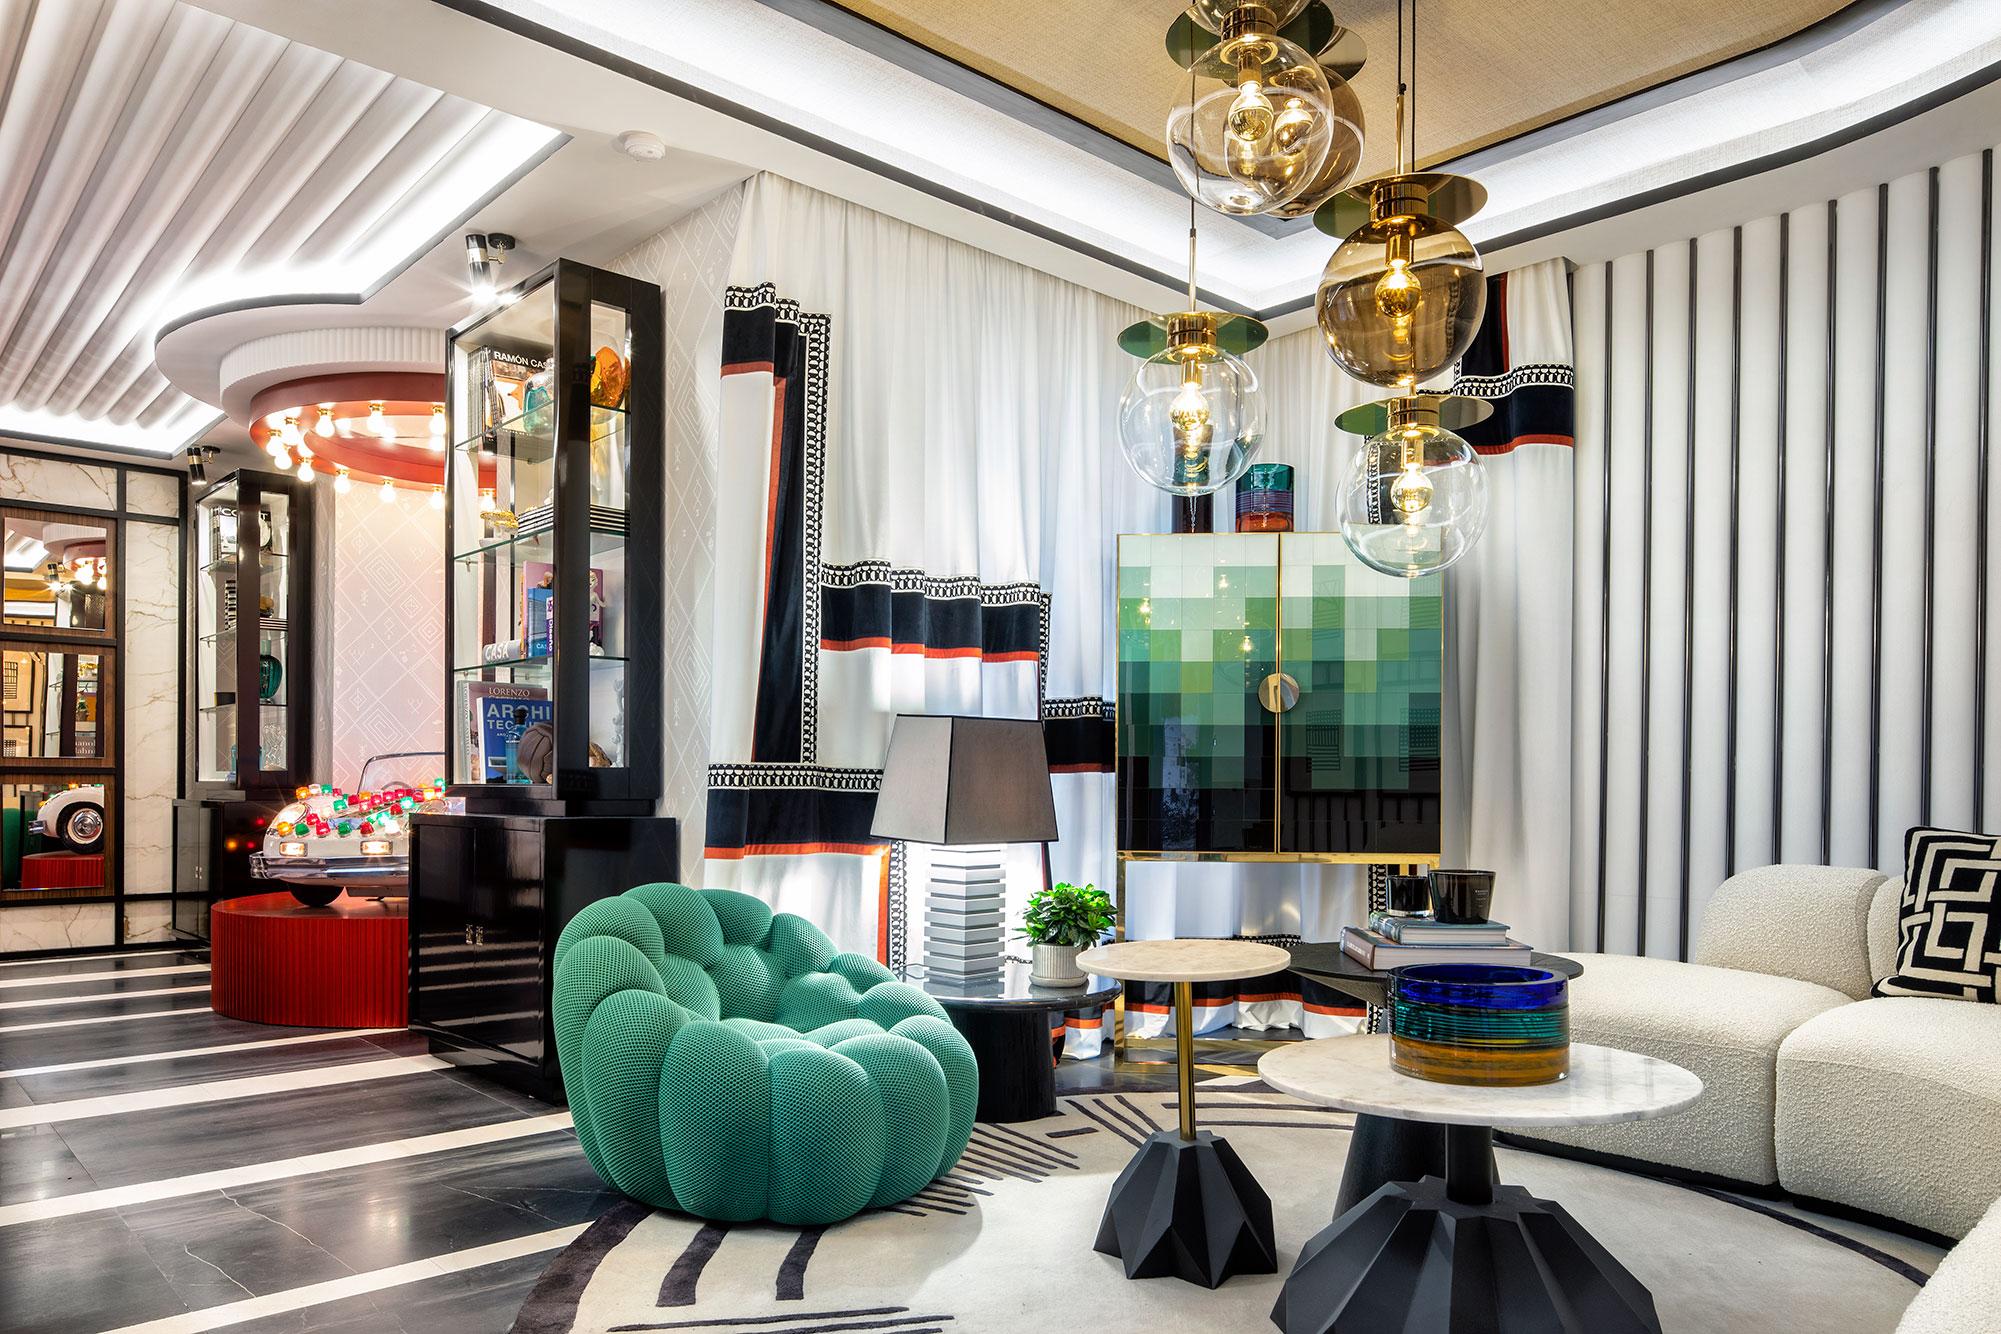 Casa Decor 2021: Diseño de Interior lujuoso de Diseñadores poderosos casa decor 2021 Casa Decor 2021: Diseño de Interior lujuoso de Diseñadores poderosos Alberto Aranda